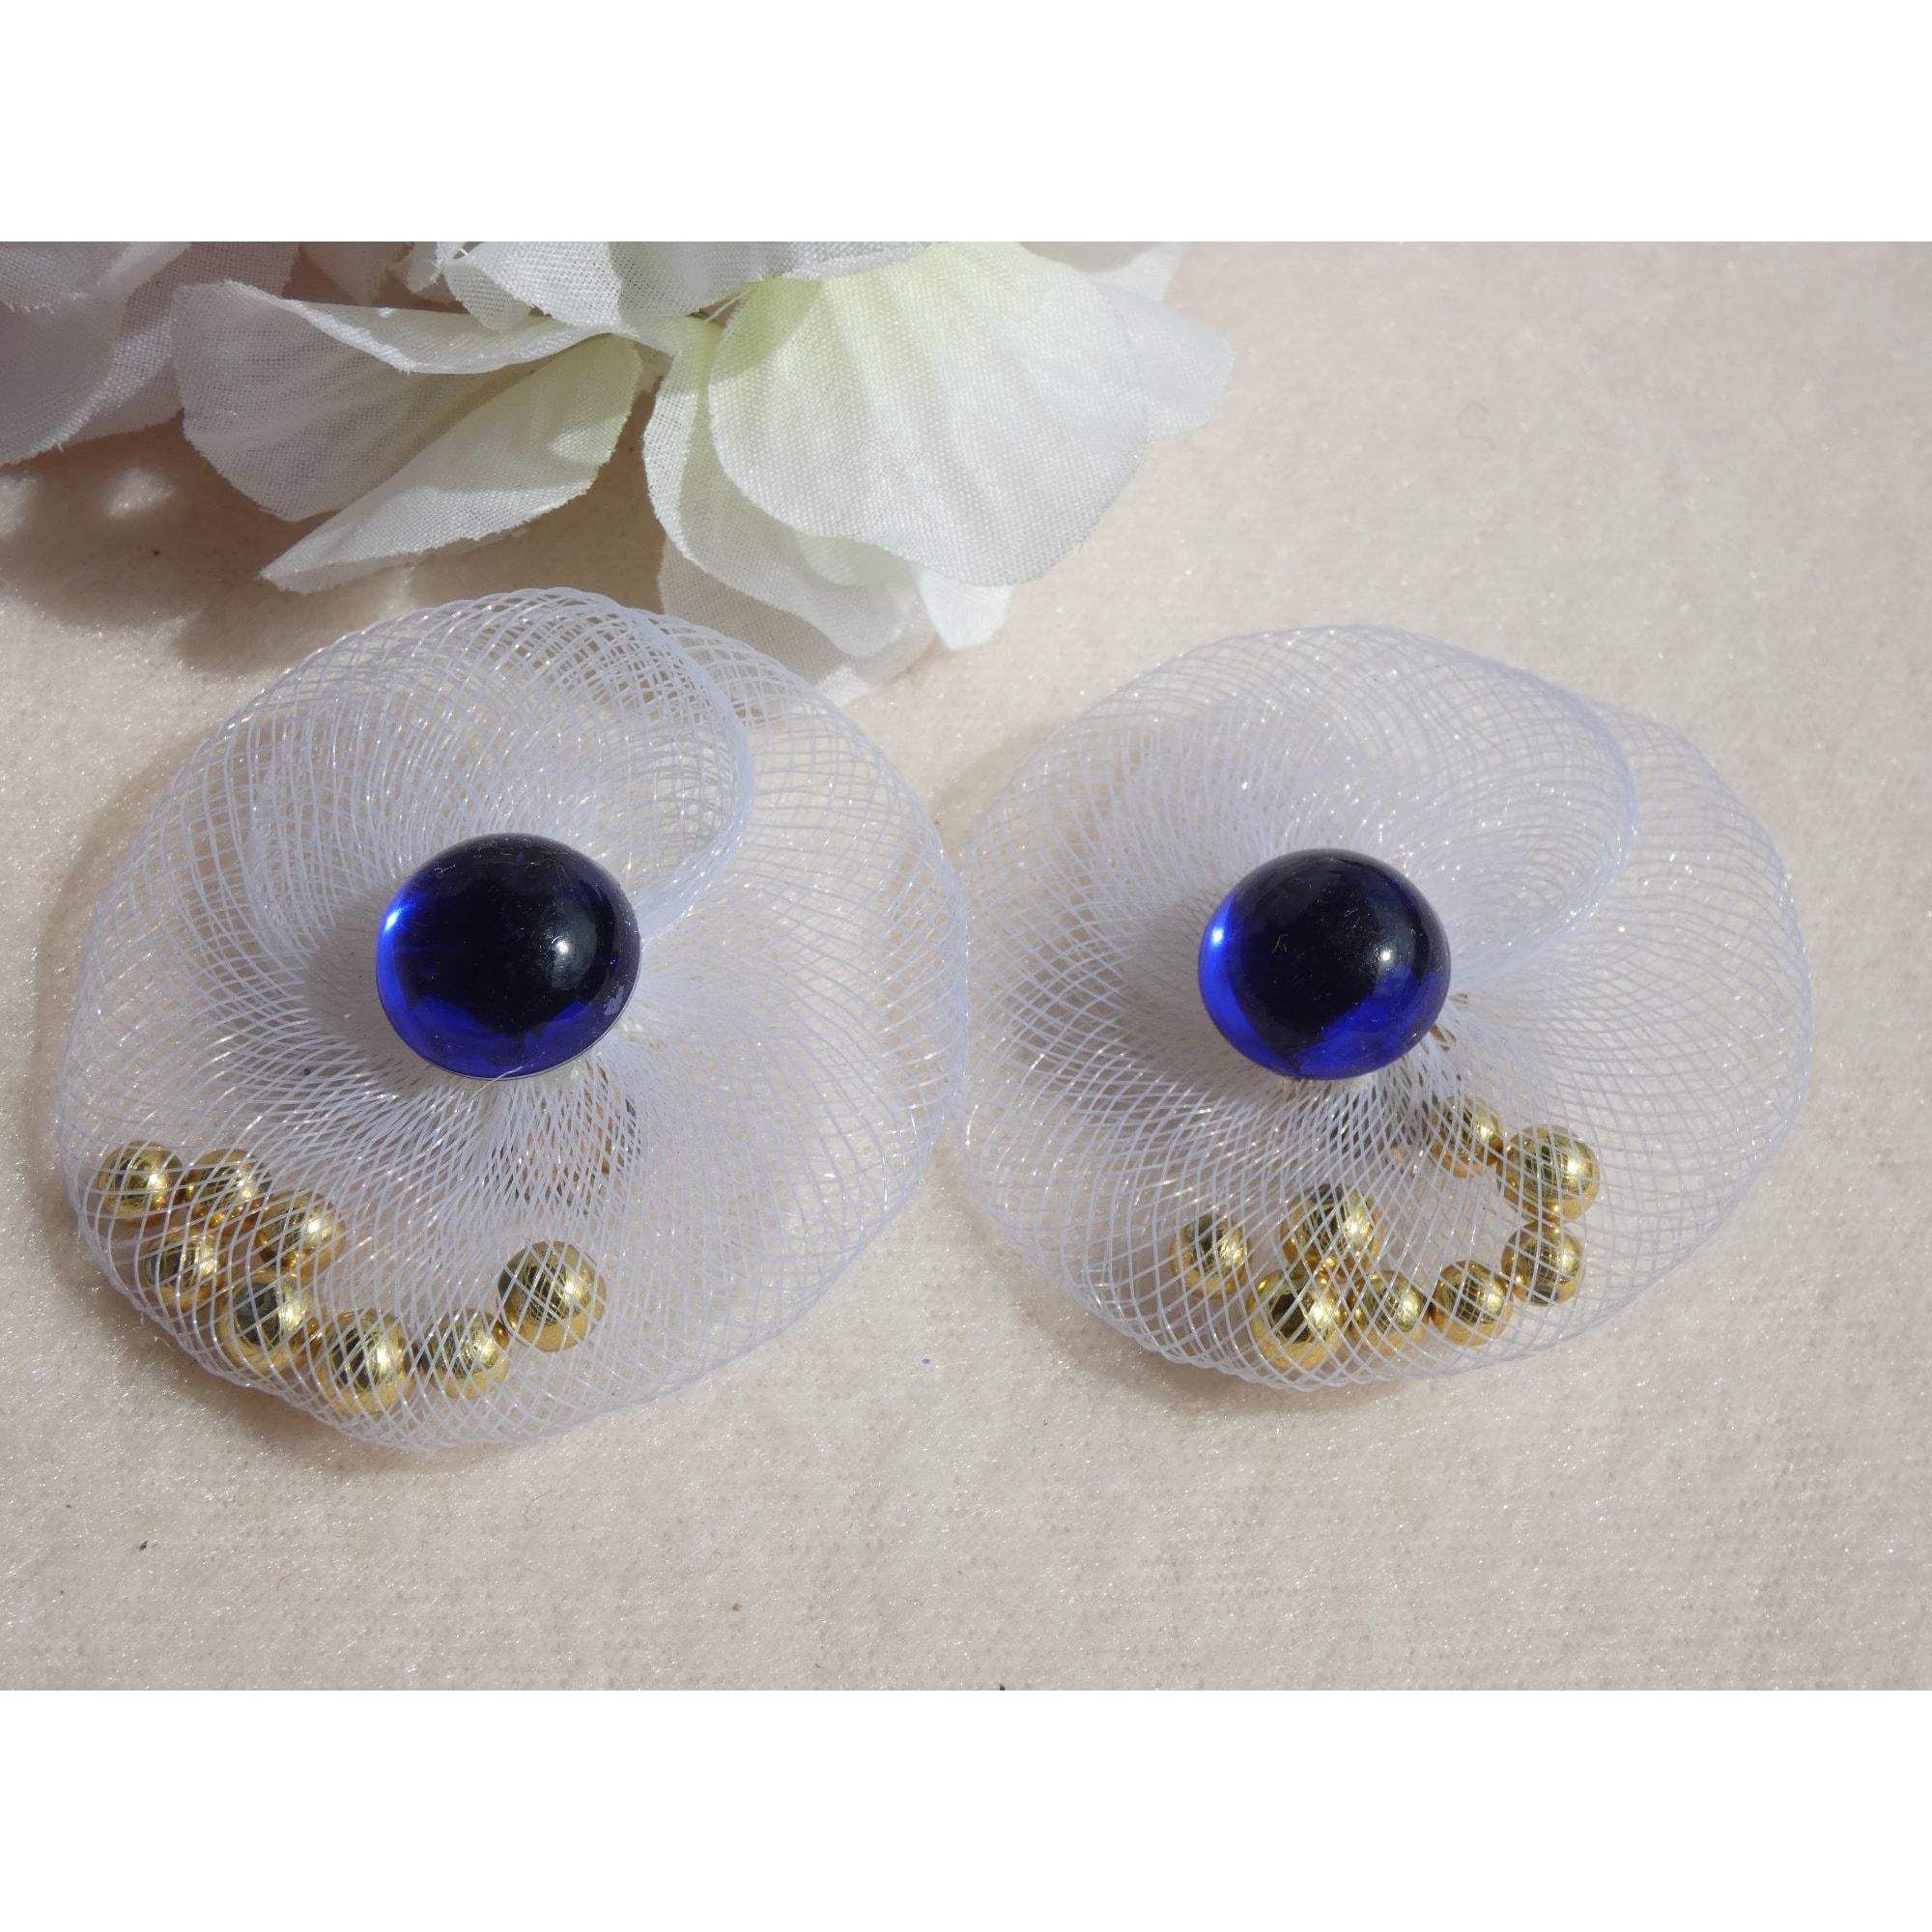 Boucles d'oreille FANTAISIE Bleu, bleu marine, bleu turquoise